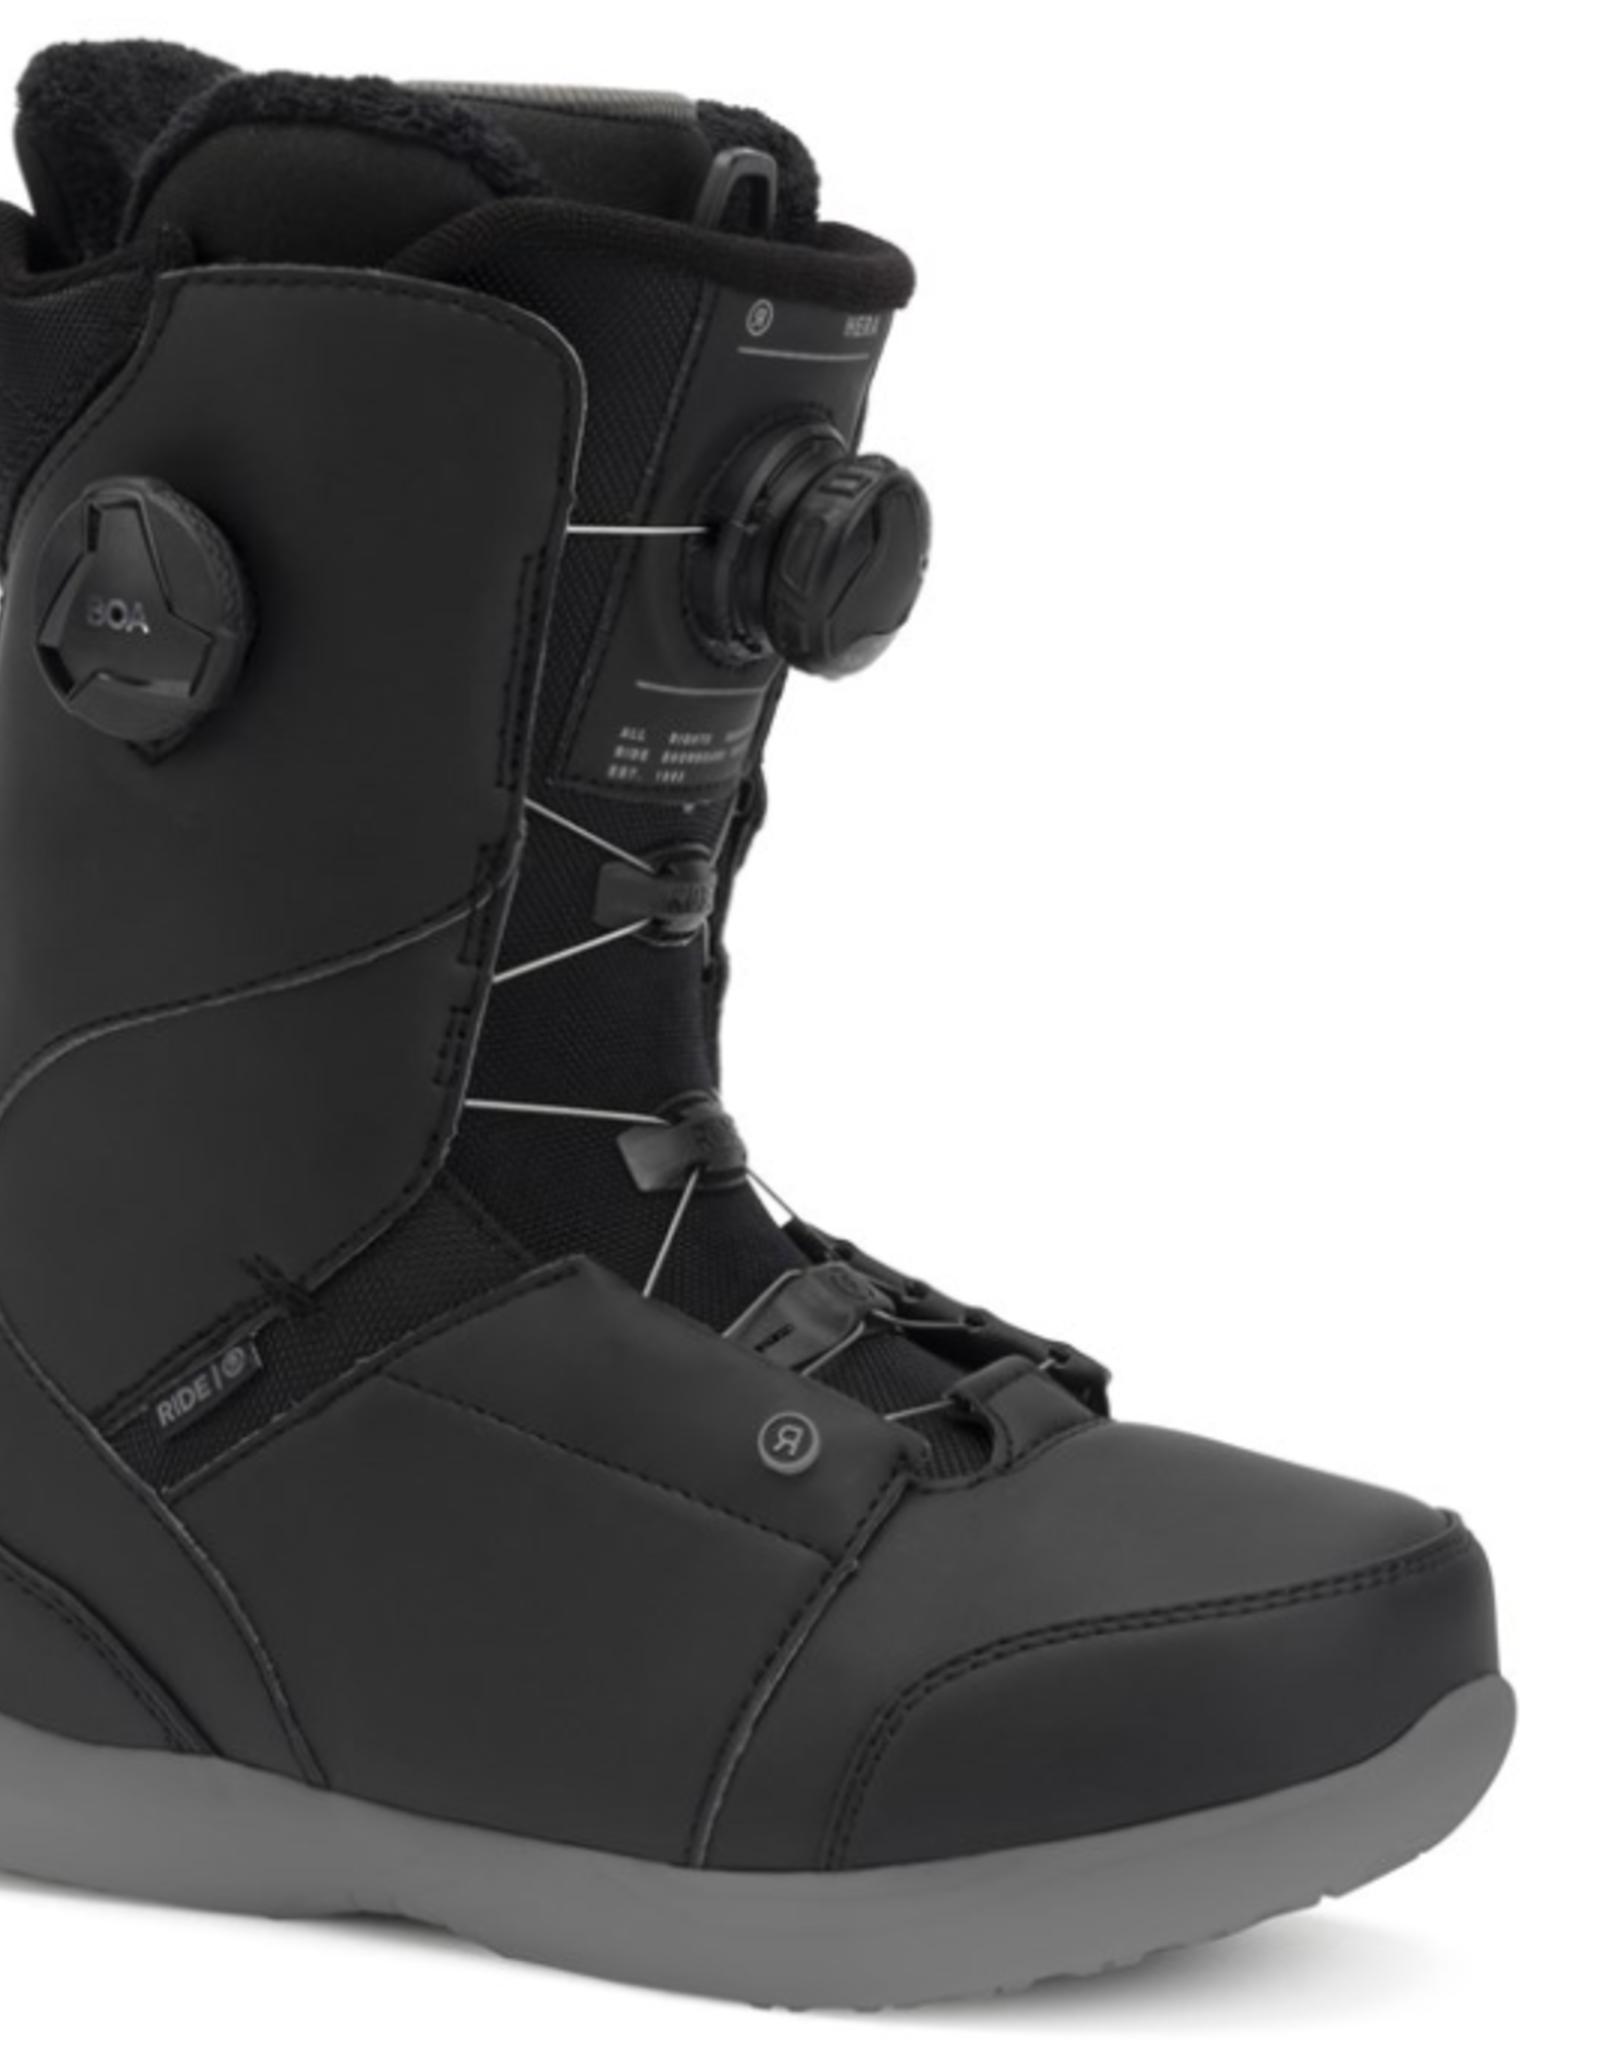 RIDE Ride Women's Hera Snowboard Boots Black 2022